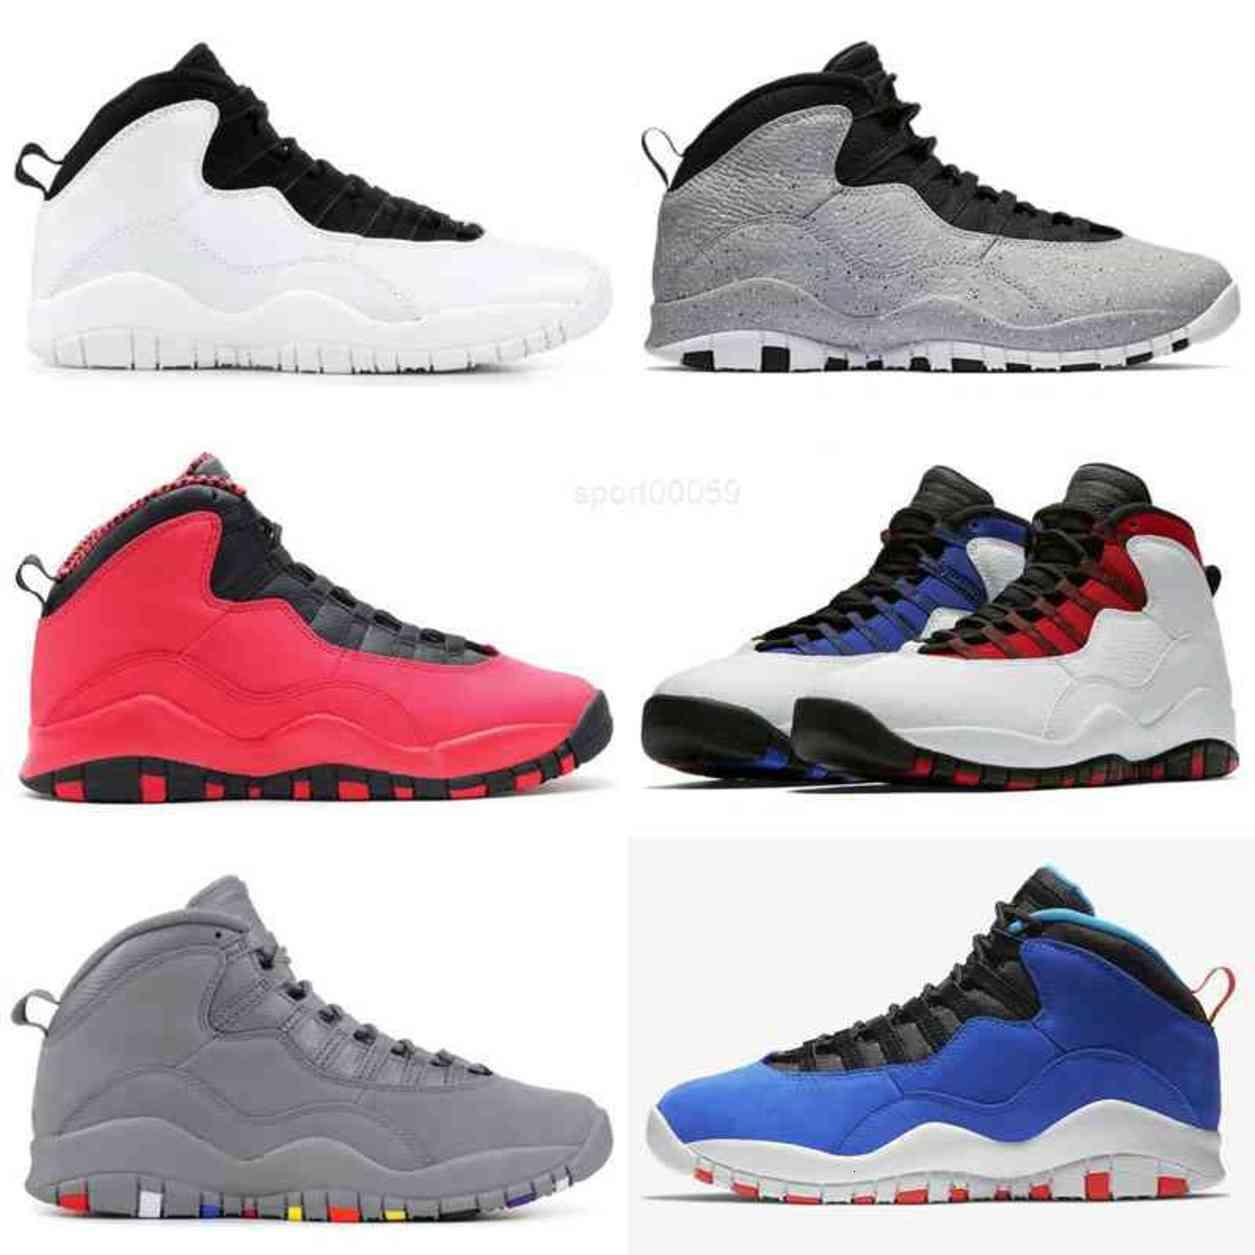 10s الرجال أحذية أطفال jumpman 10 أورلاندو تينكر المتسابق الأزرق الأسمنت ويسبروك أنا تعود أسود أبيض مدرب رياضة رياضية